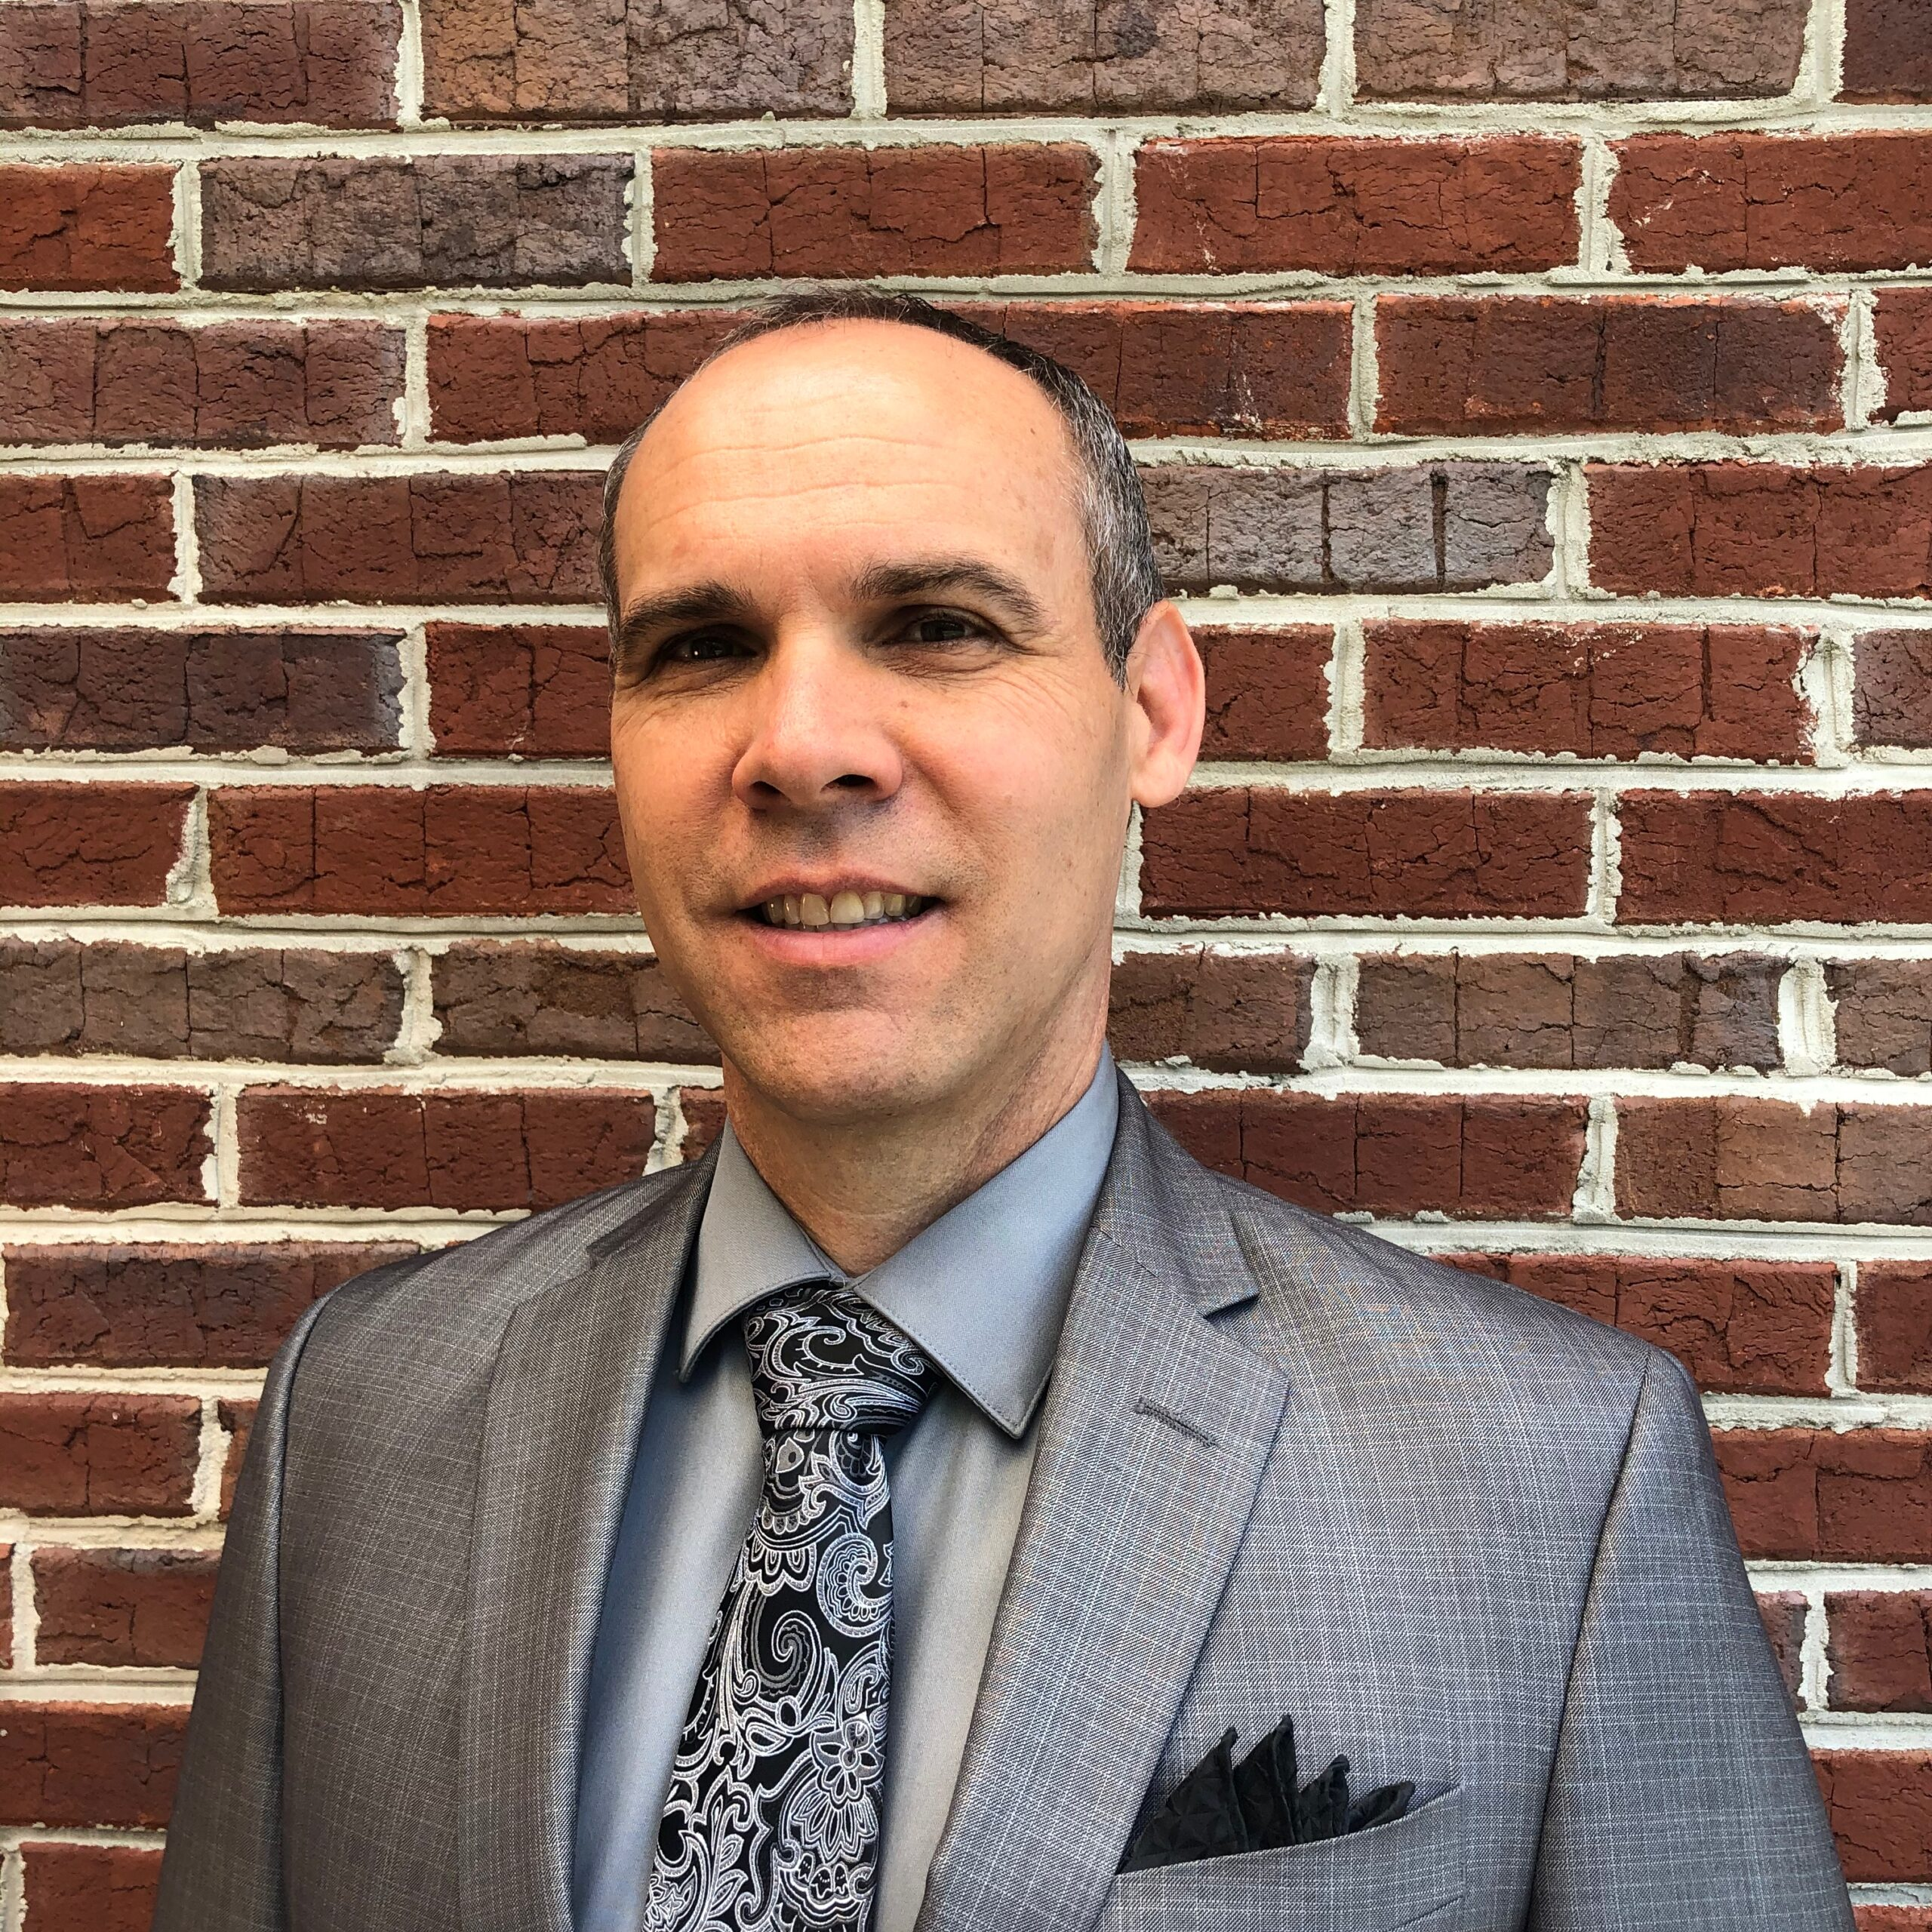 Sheldon Sapoznik, VP of North America, BioGill